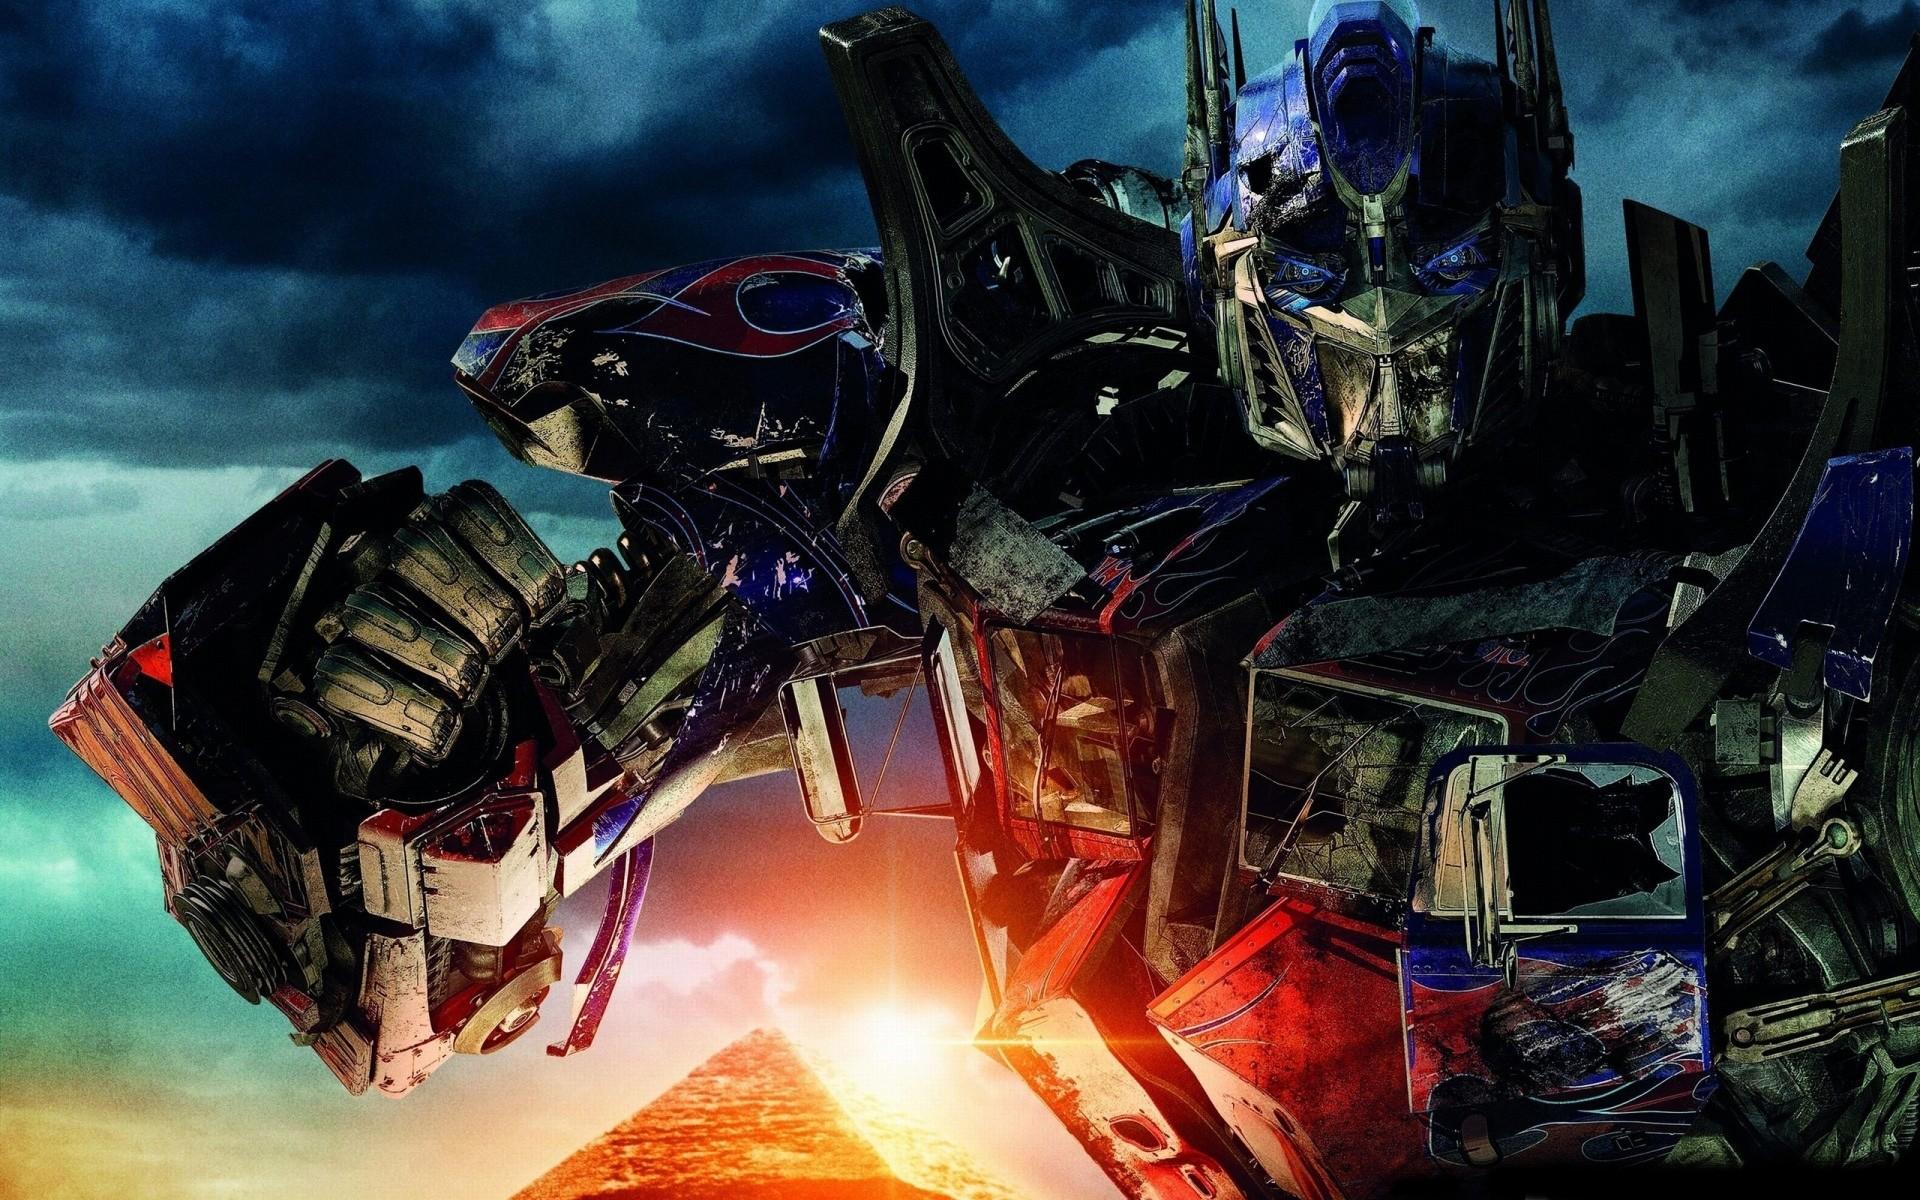 Transformers Fall Of Cybertron Wallpaper 1920x1080 Transformers Cybertron Wallpaper 80 Images